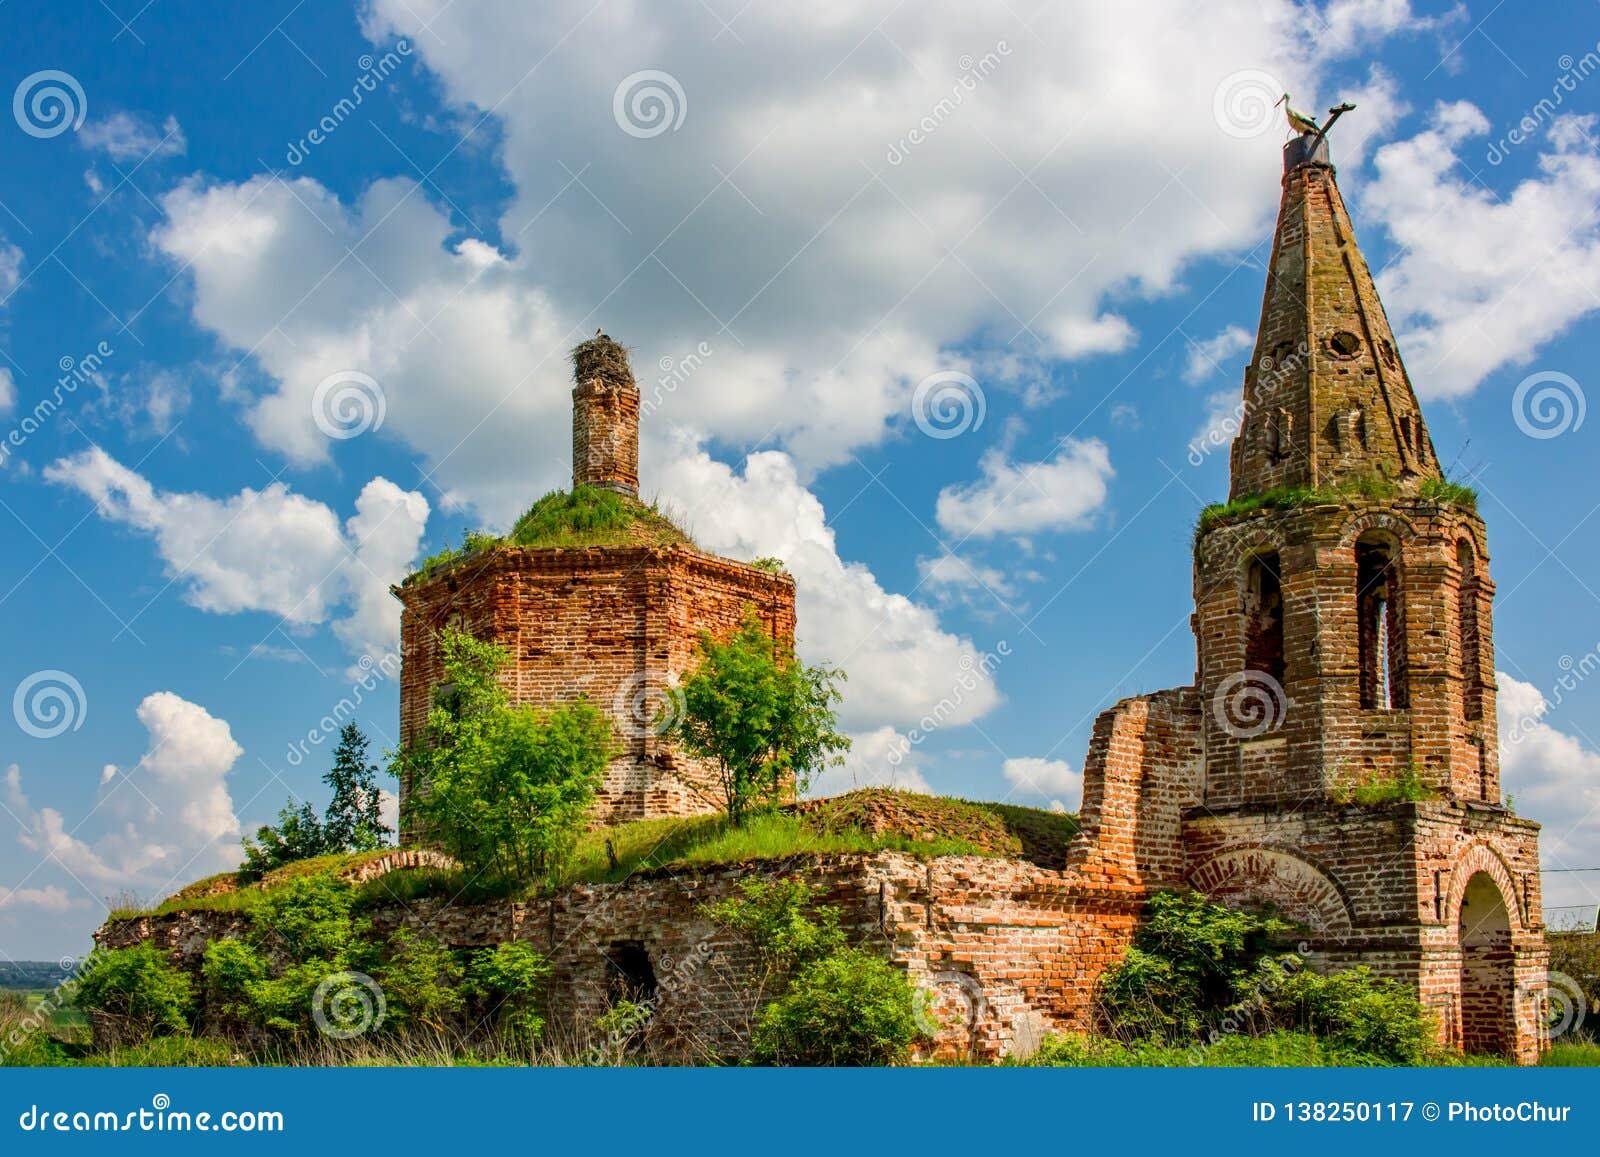 Ruínas da igreja abandonada de St John o evangelista do século XVIII